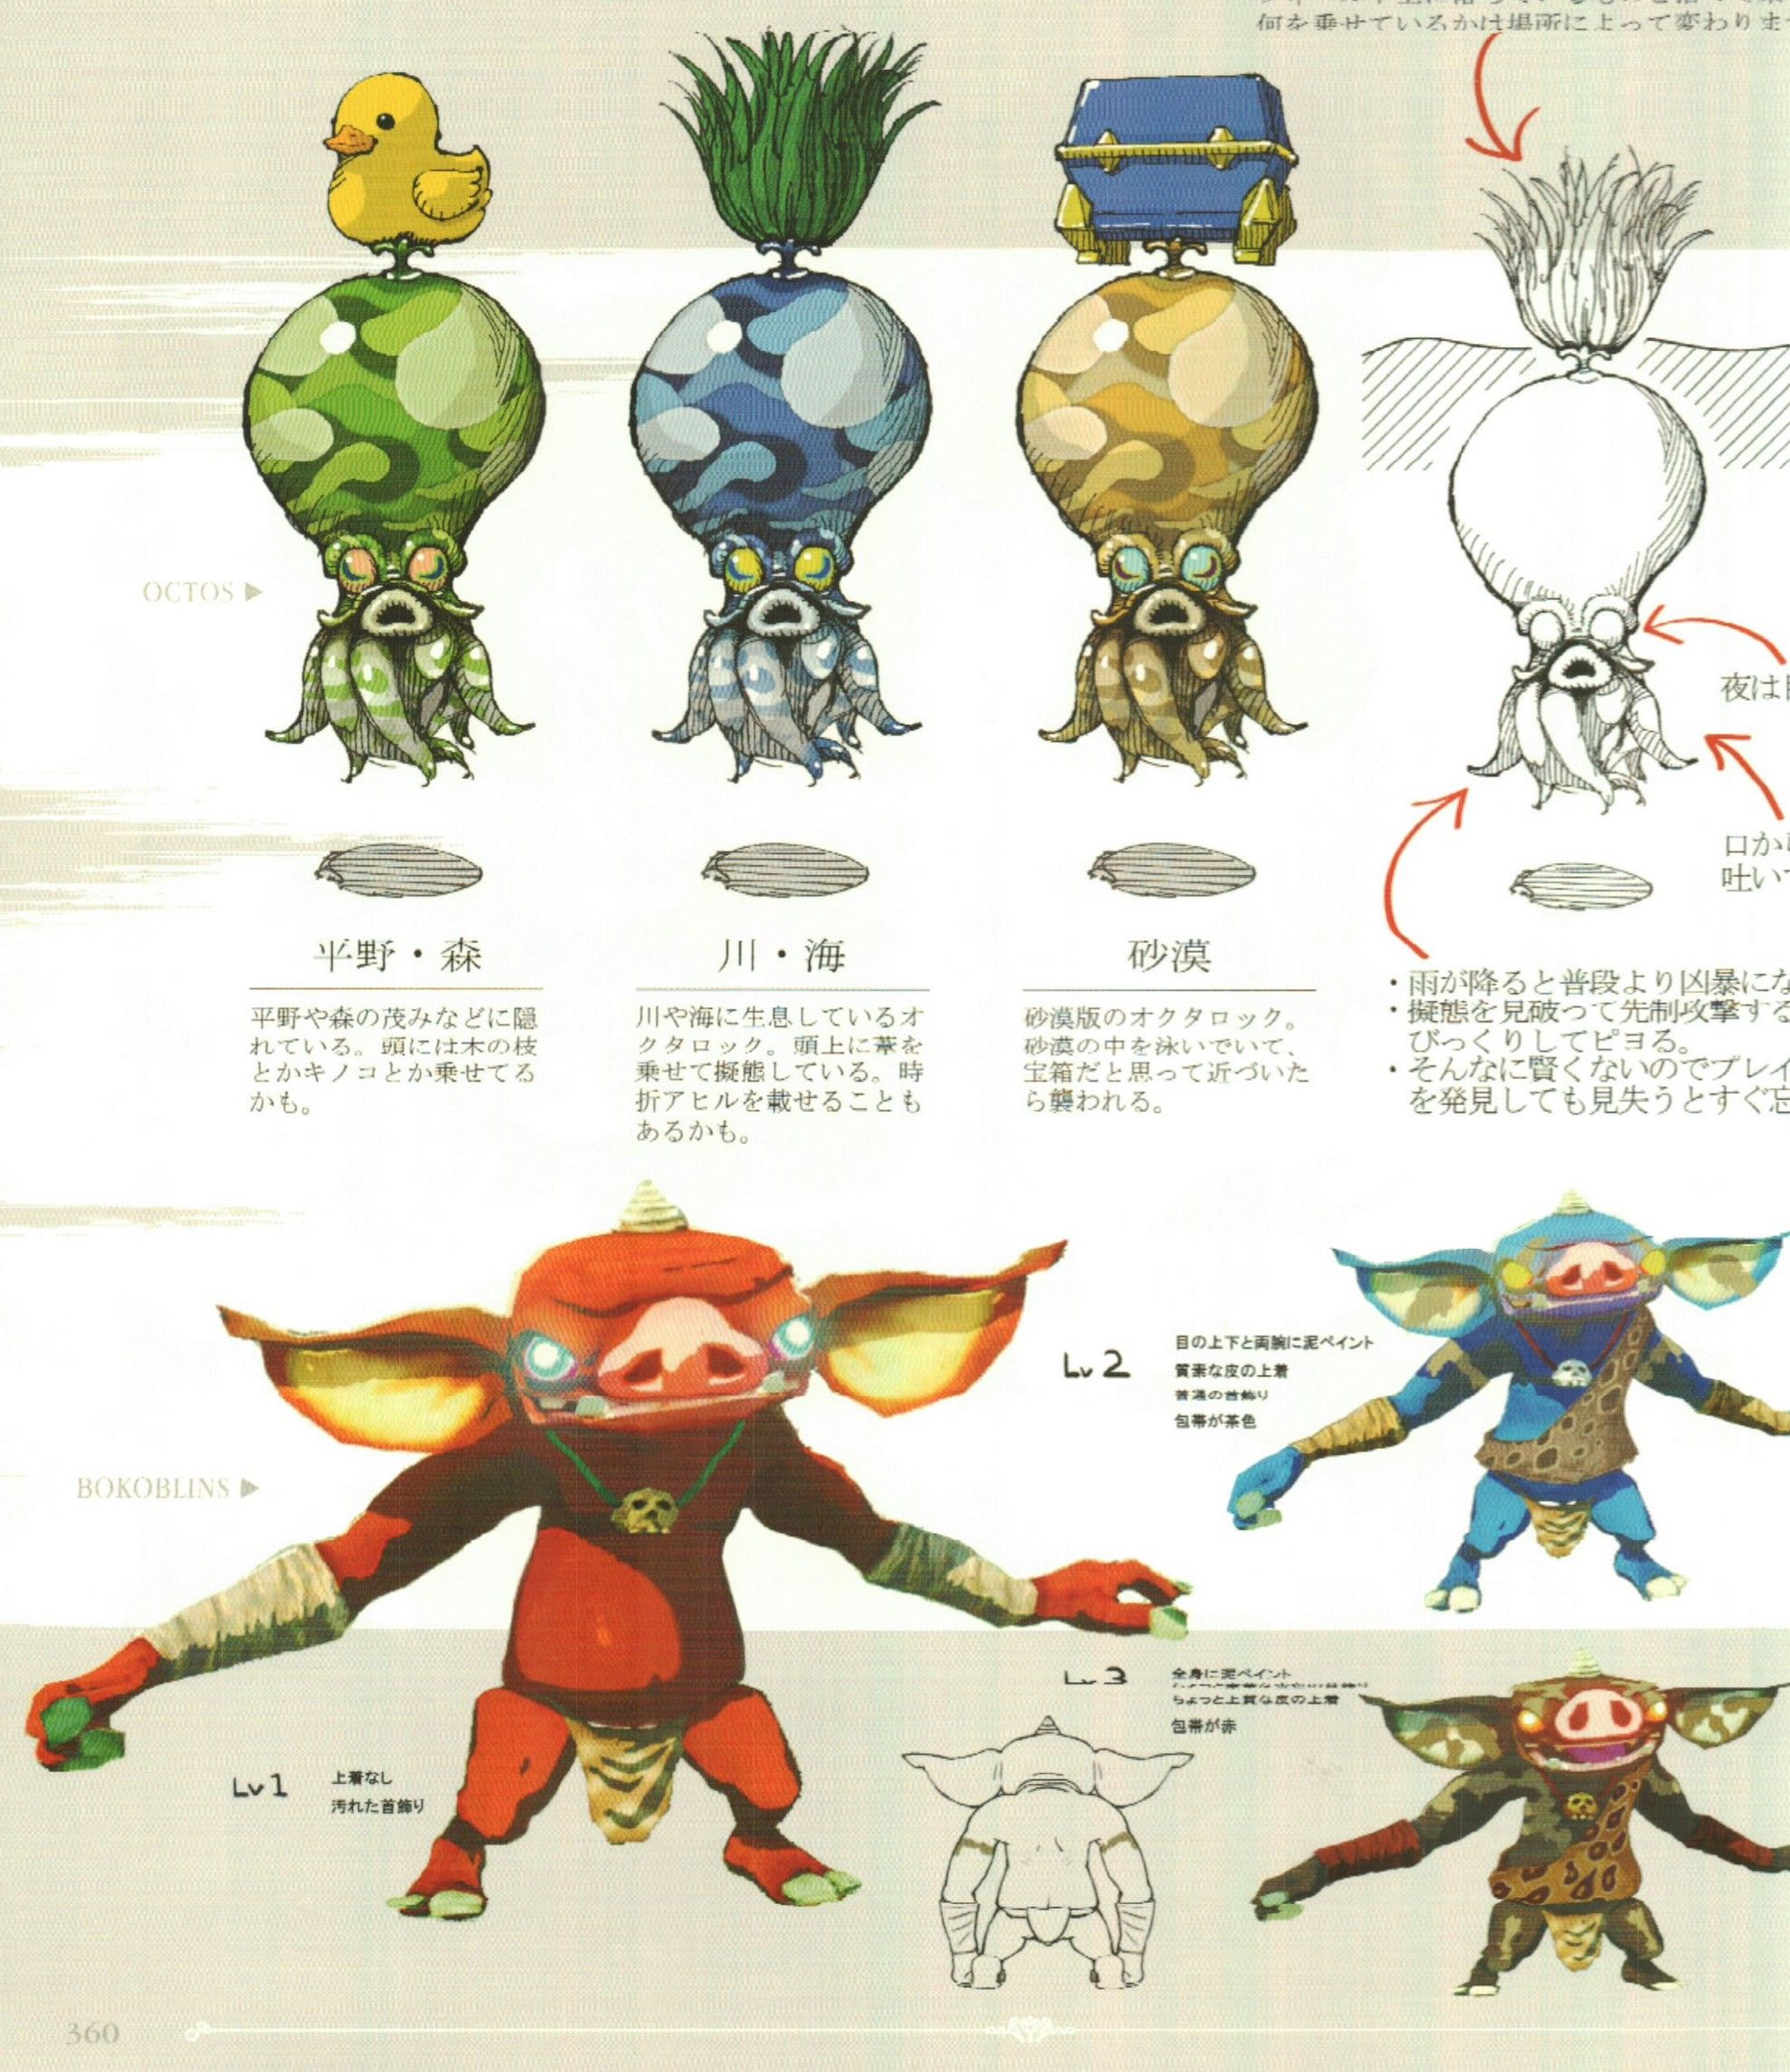 Magnifiques Nouveaux Artworks De The Legend Of Zelda Breath Of The Wild En 2020 Dessin Zelda Personnage Zelda Dessin Jeux Video